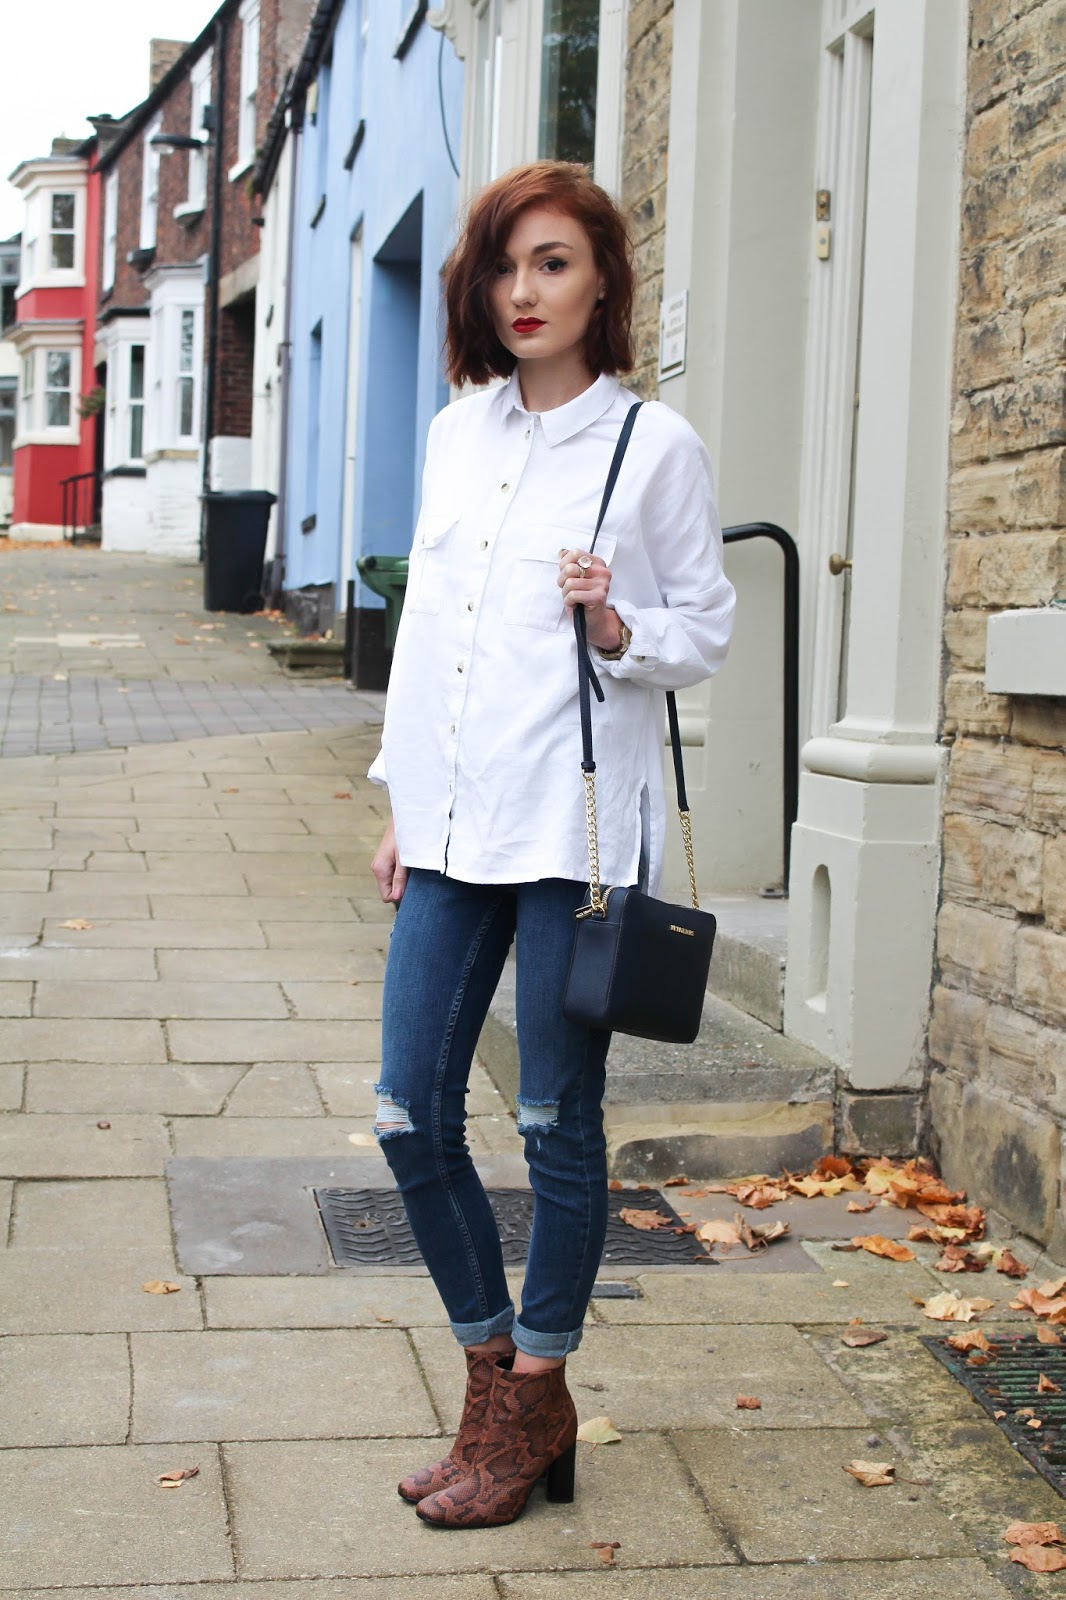 b957dab5 Snake Eyes | Salt and Chic // UK Fashion Blog | Bloglovin'